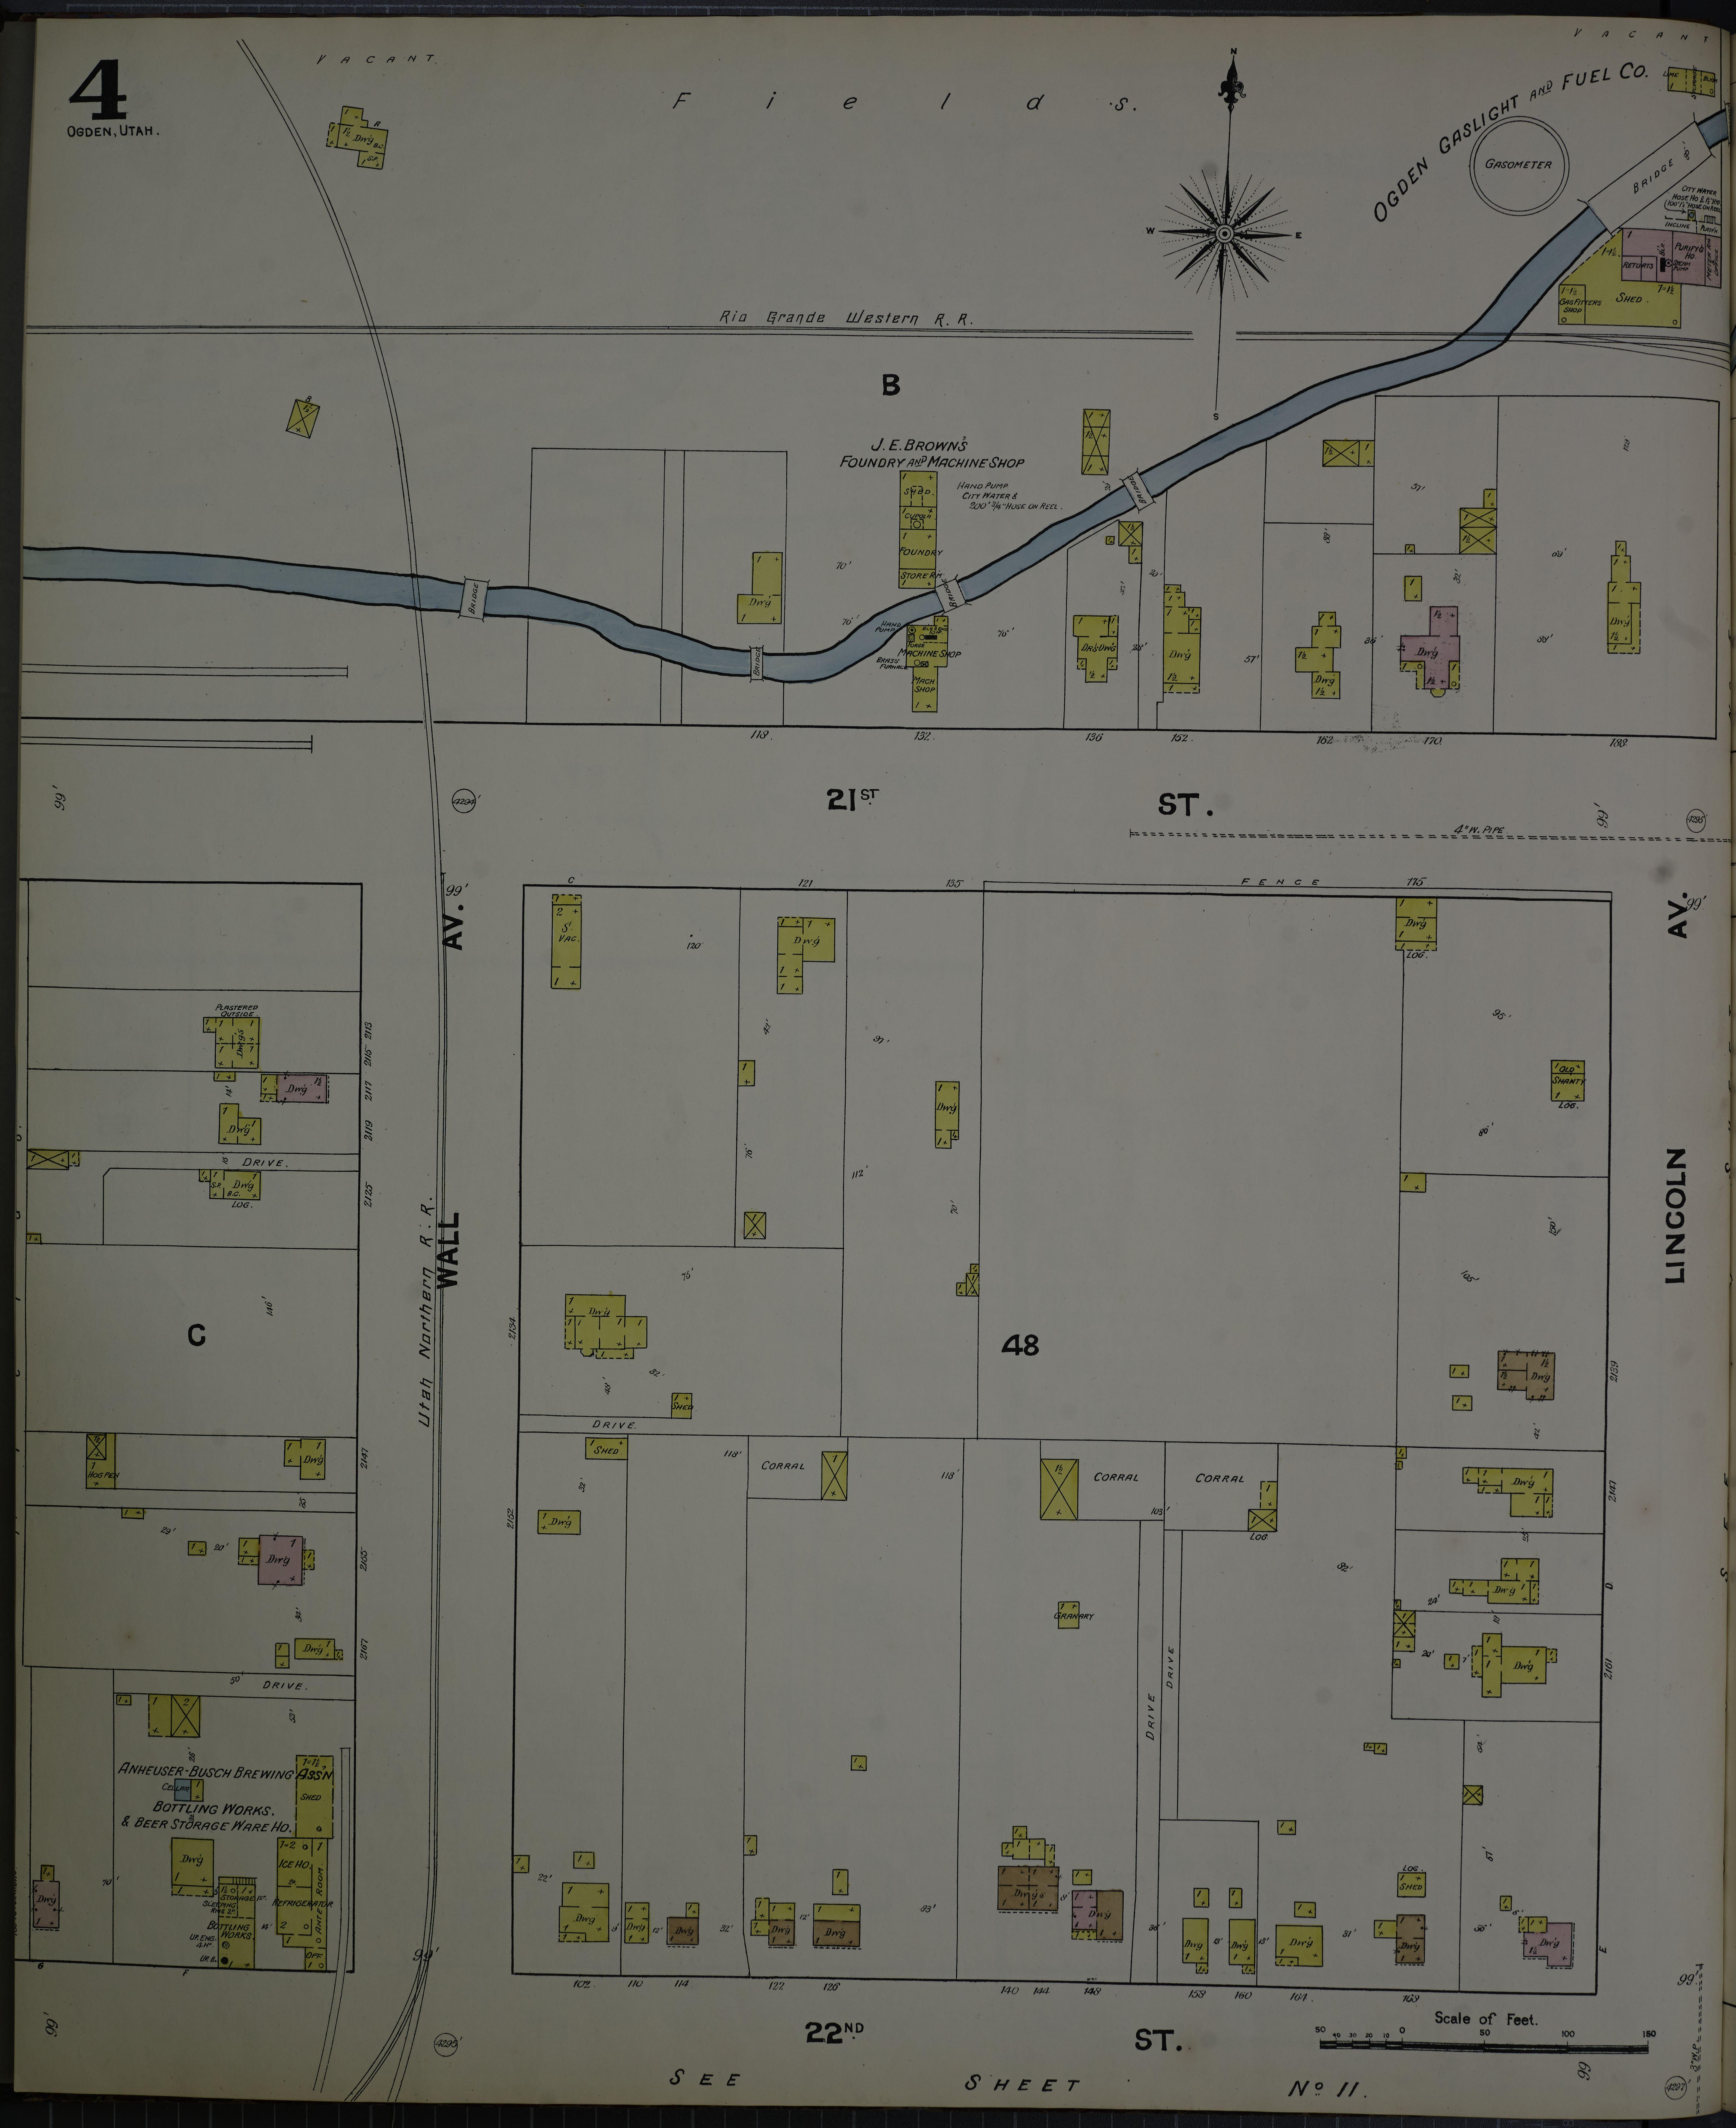 File:Sanborn Fire Insurance Map From Ogden, Weber County